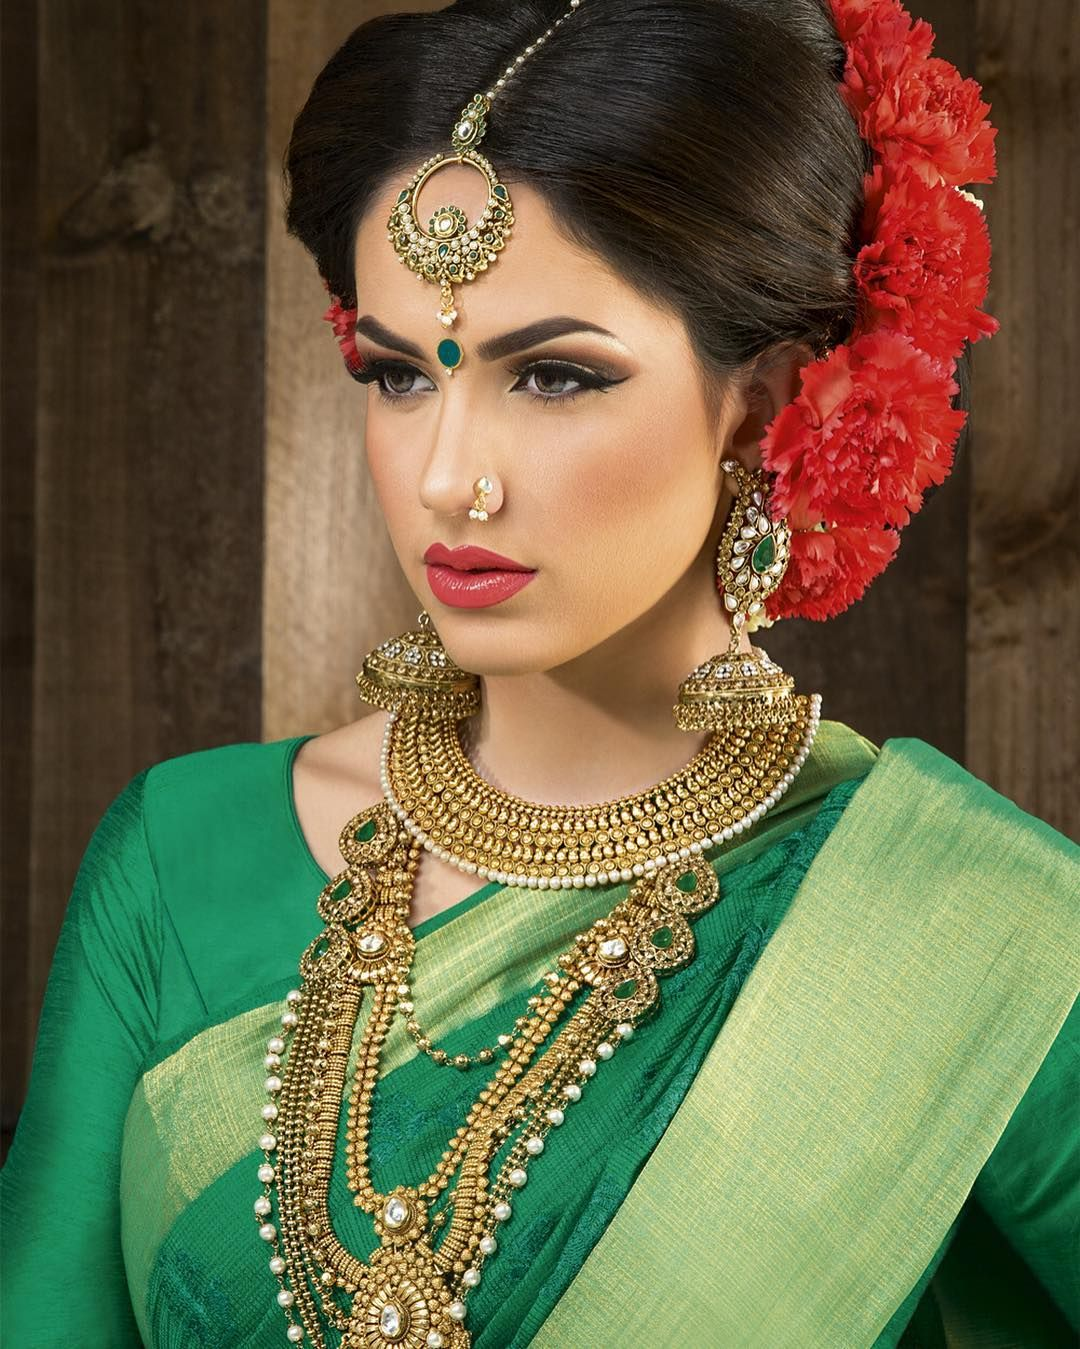 Make up chandenimua greensaree ukmakeup tamilwedding